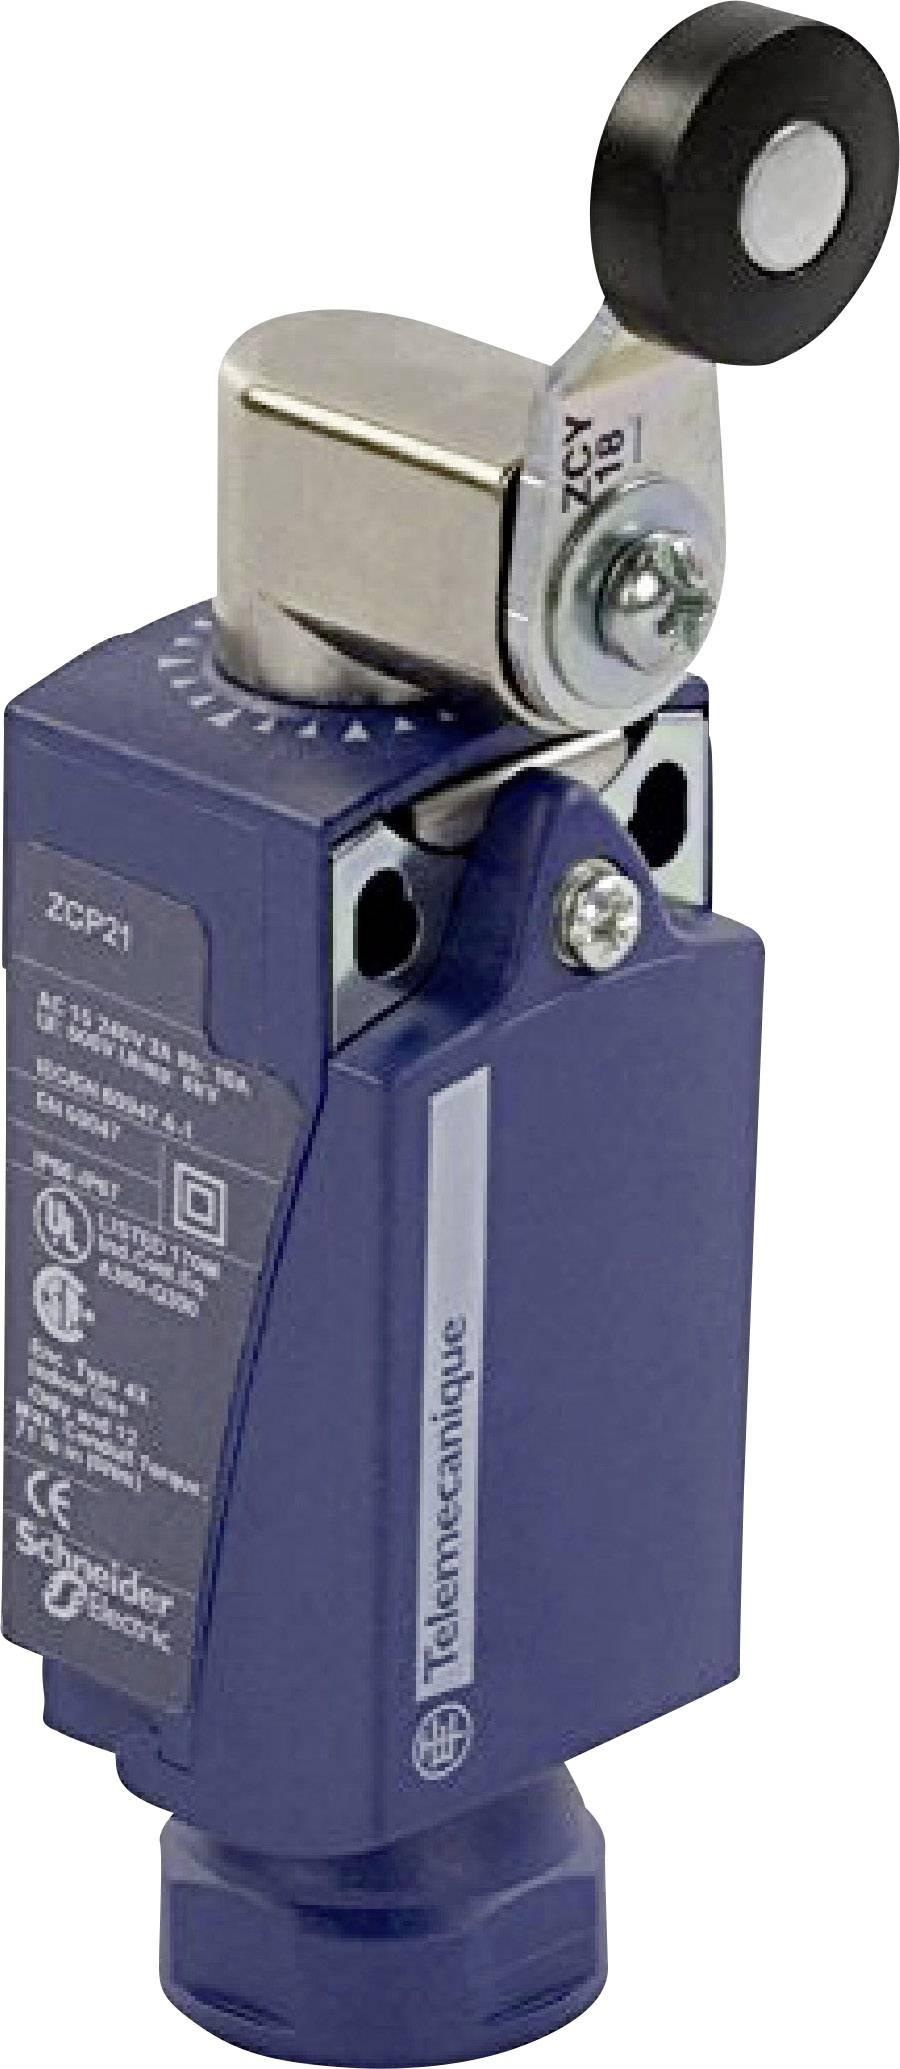 Koncový spínač Schneider Electric XCKP2118M12, páka s rolnou, bez aretace, IP67, 1 ks